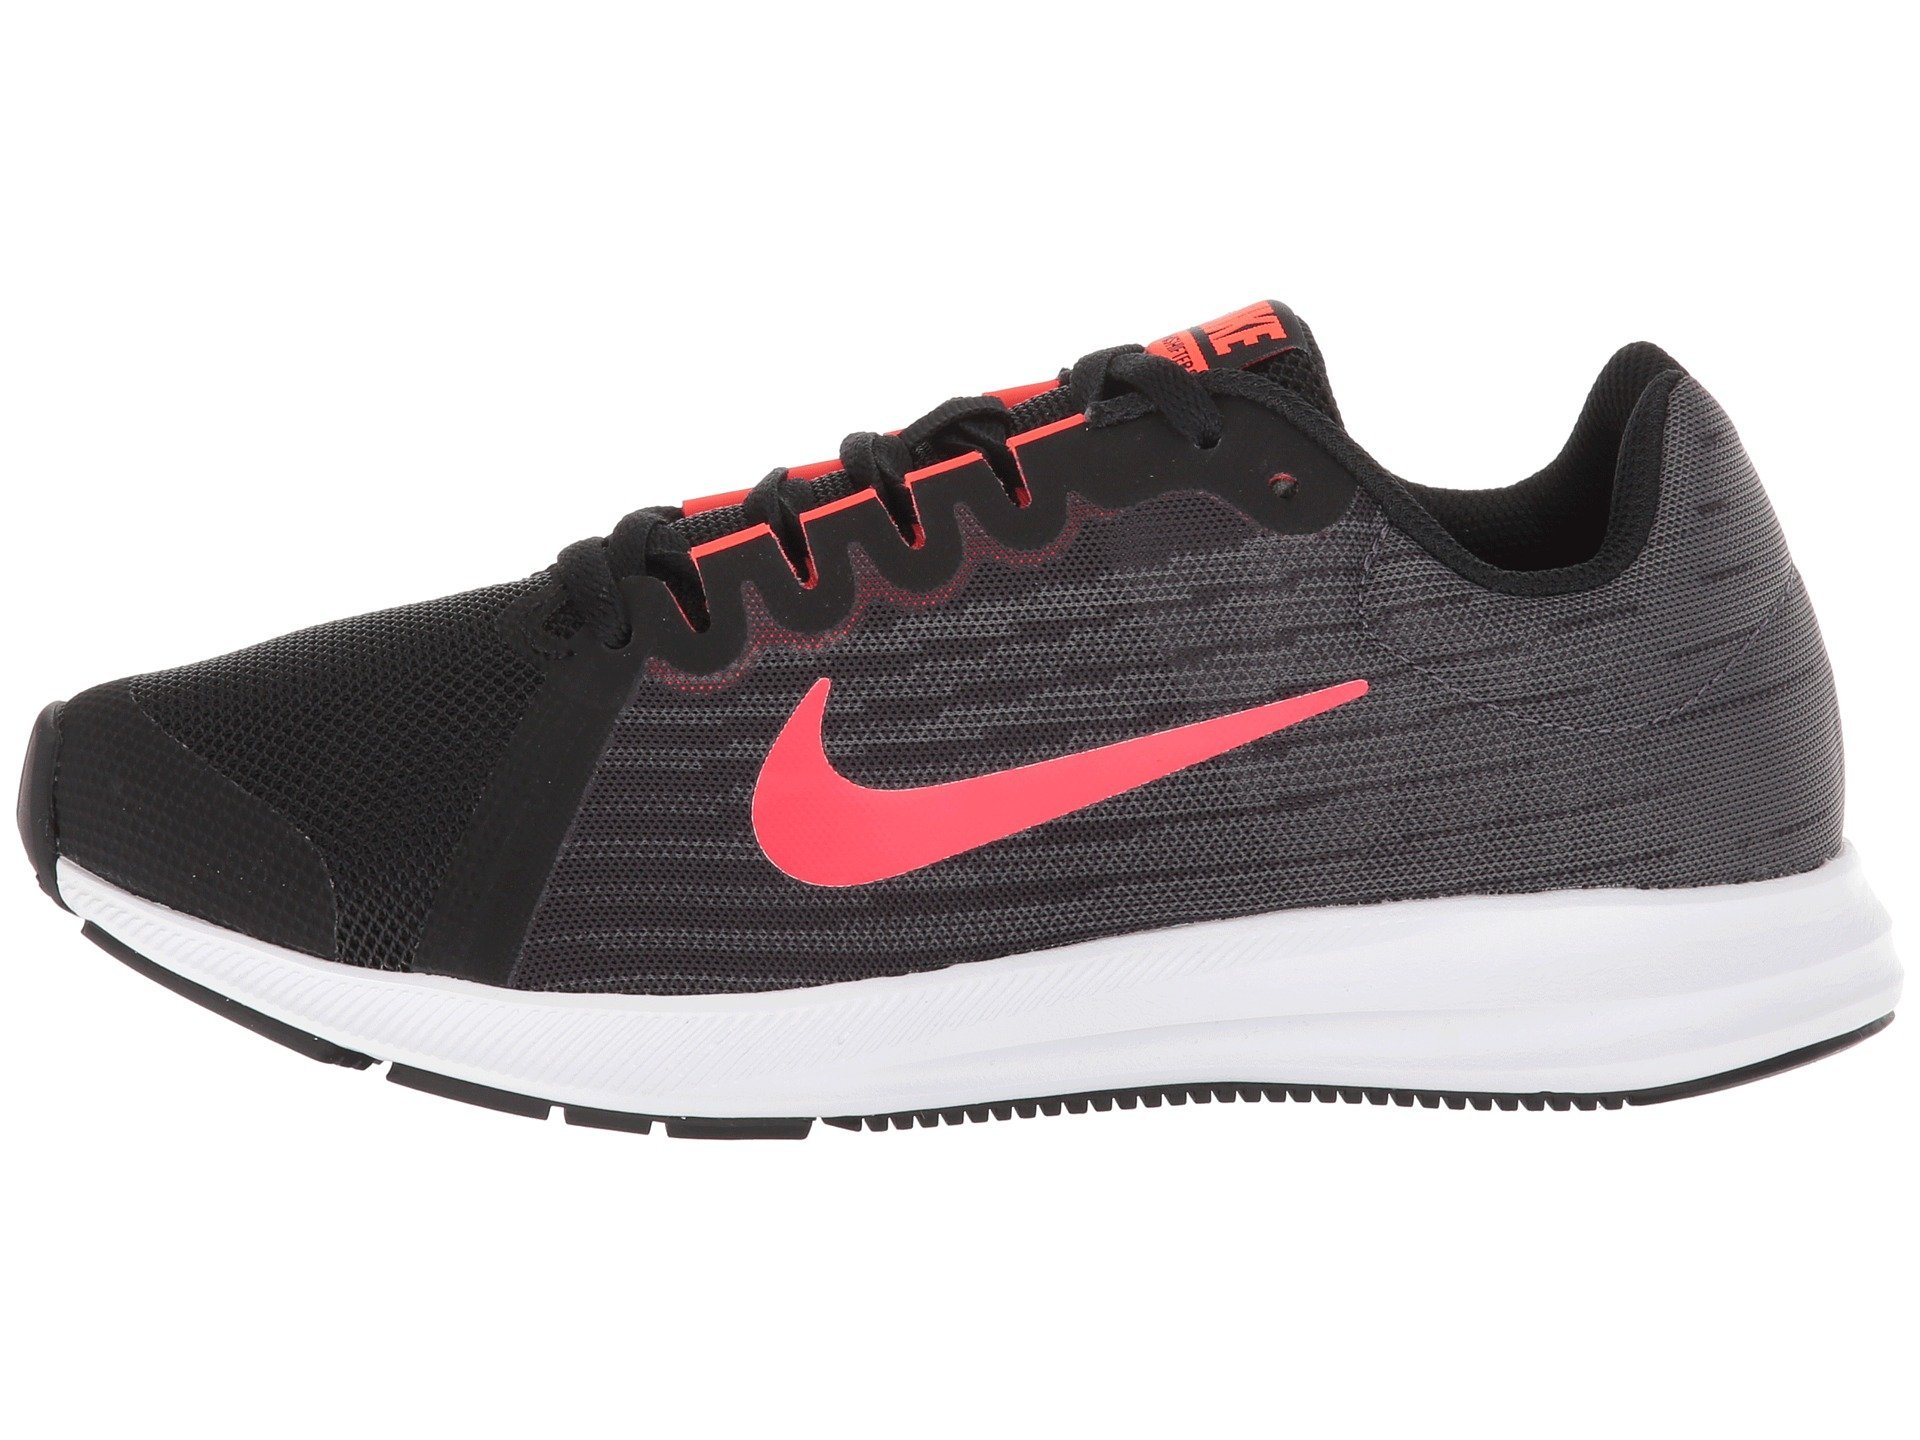 NIKE Kids Downshifter 8 (GS) Running Shoes (6 Big Kid M, Black/Bright Crimson/Dark Grey)